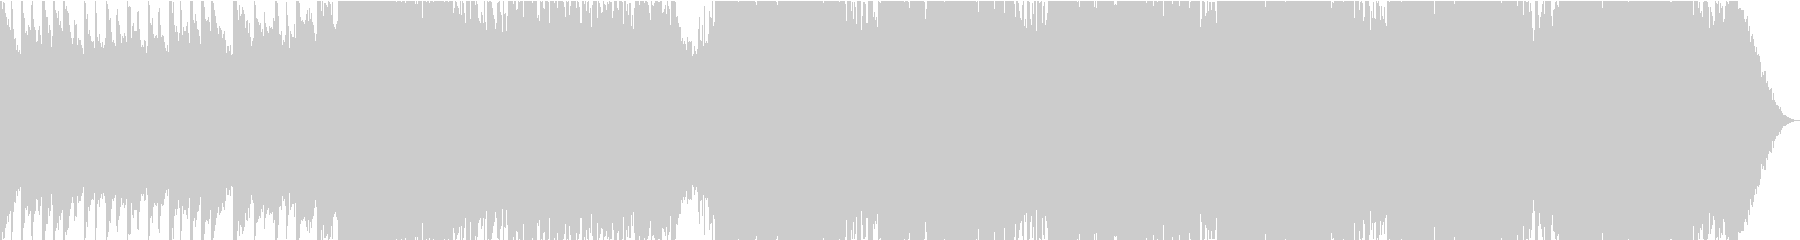 Background Musicの未再生の波形